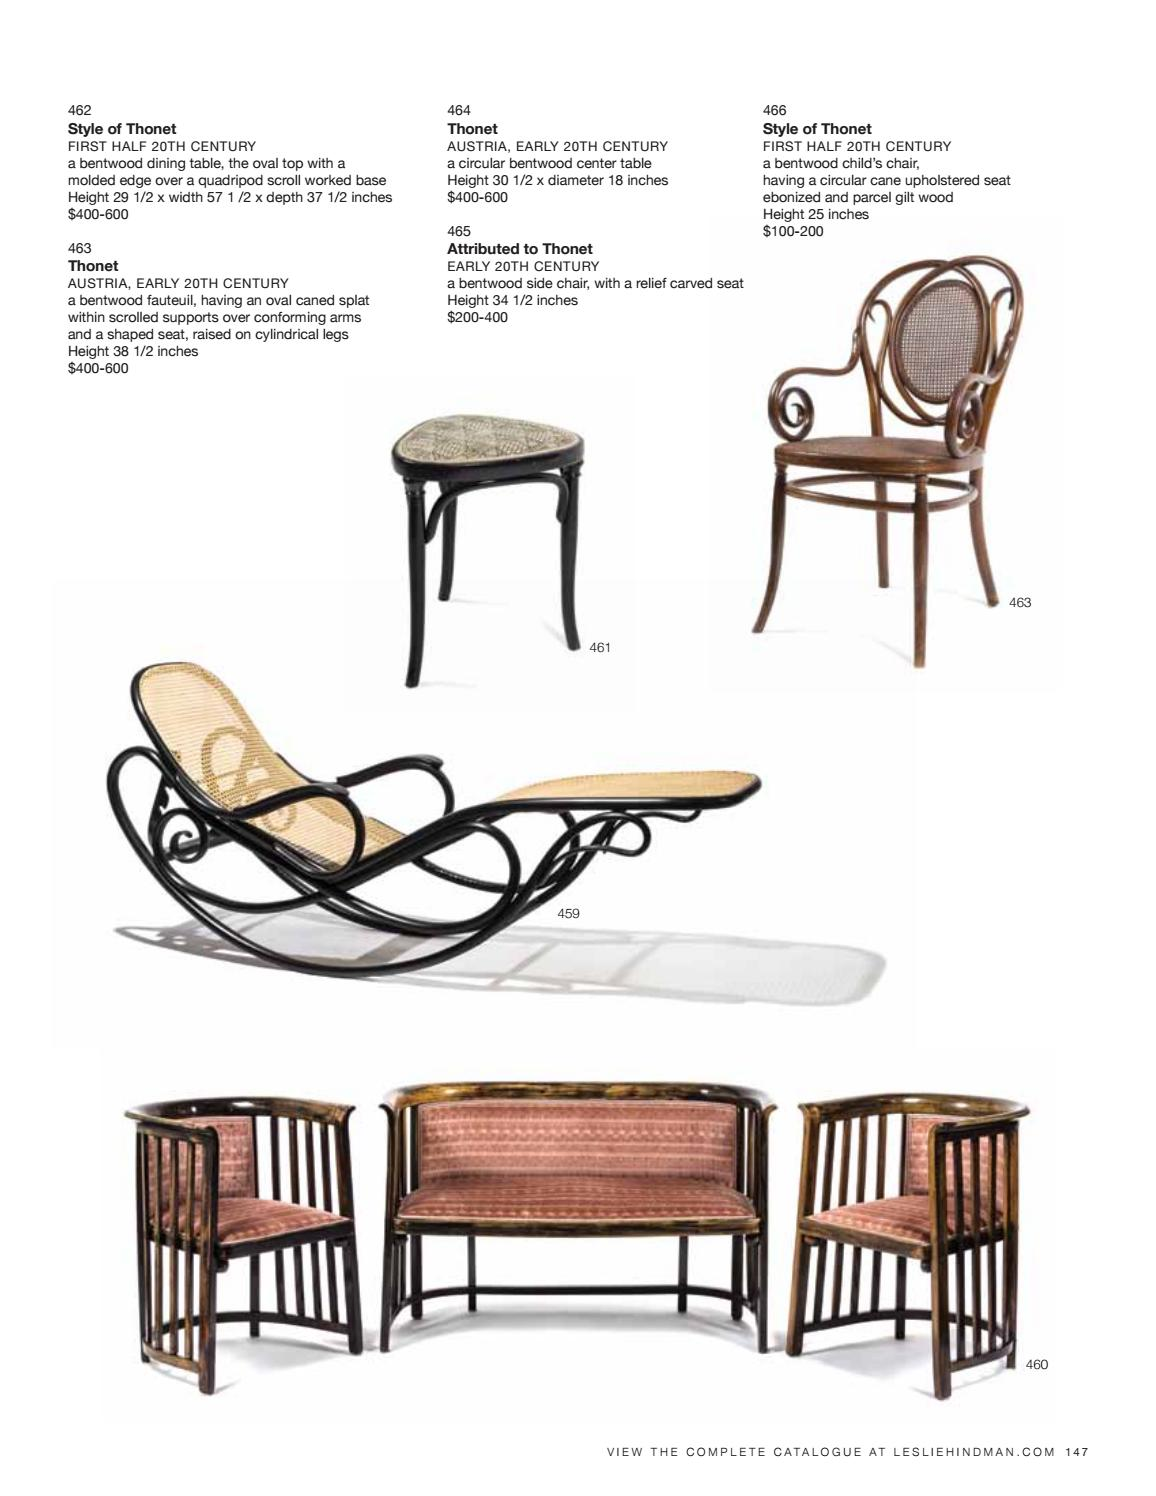 Modern Design Fauteuil.Sale 467 Modern Design By Hindman Issuu